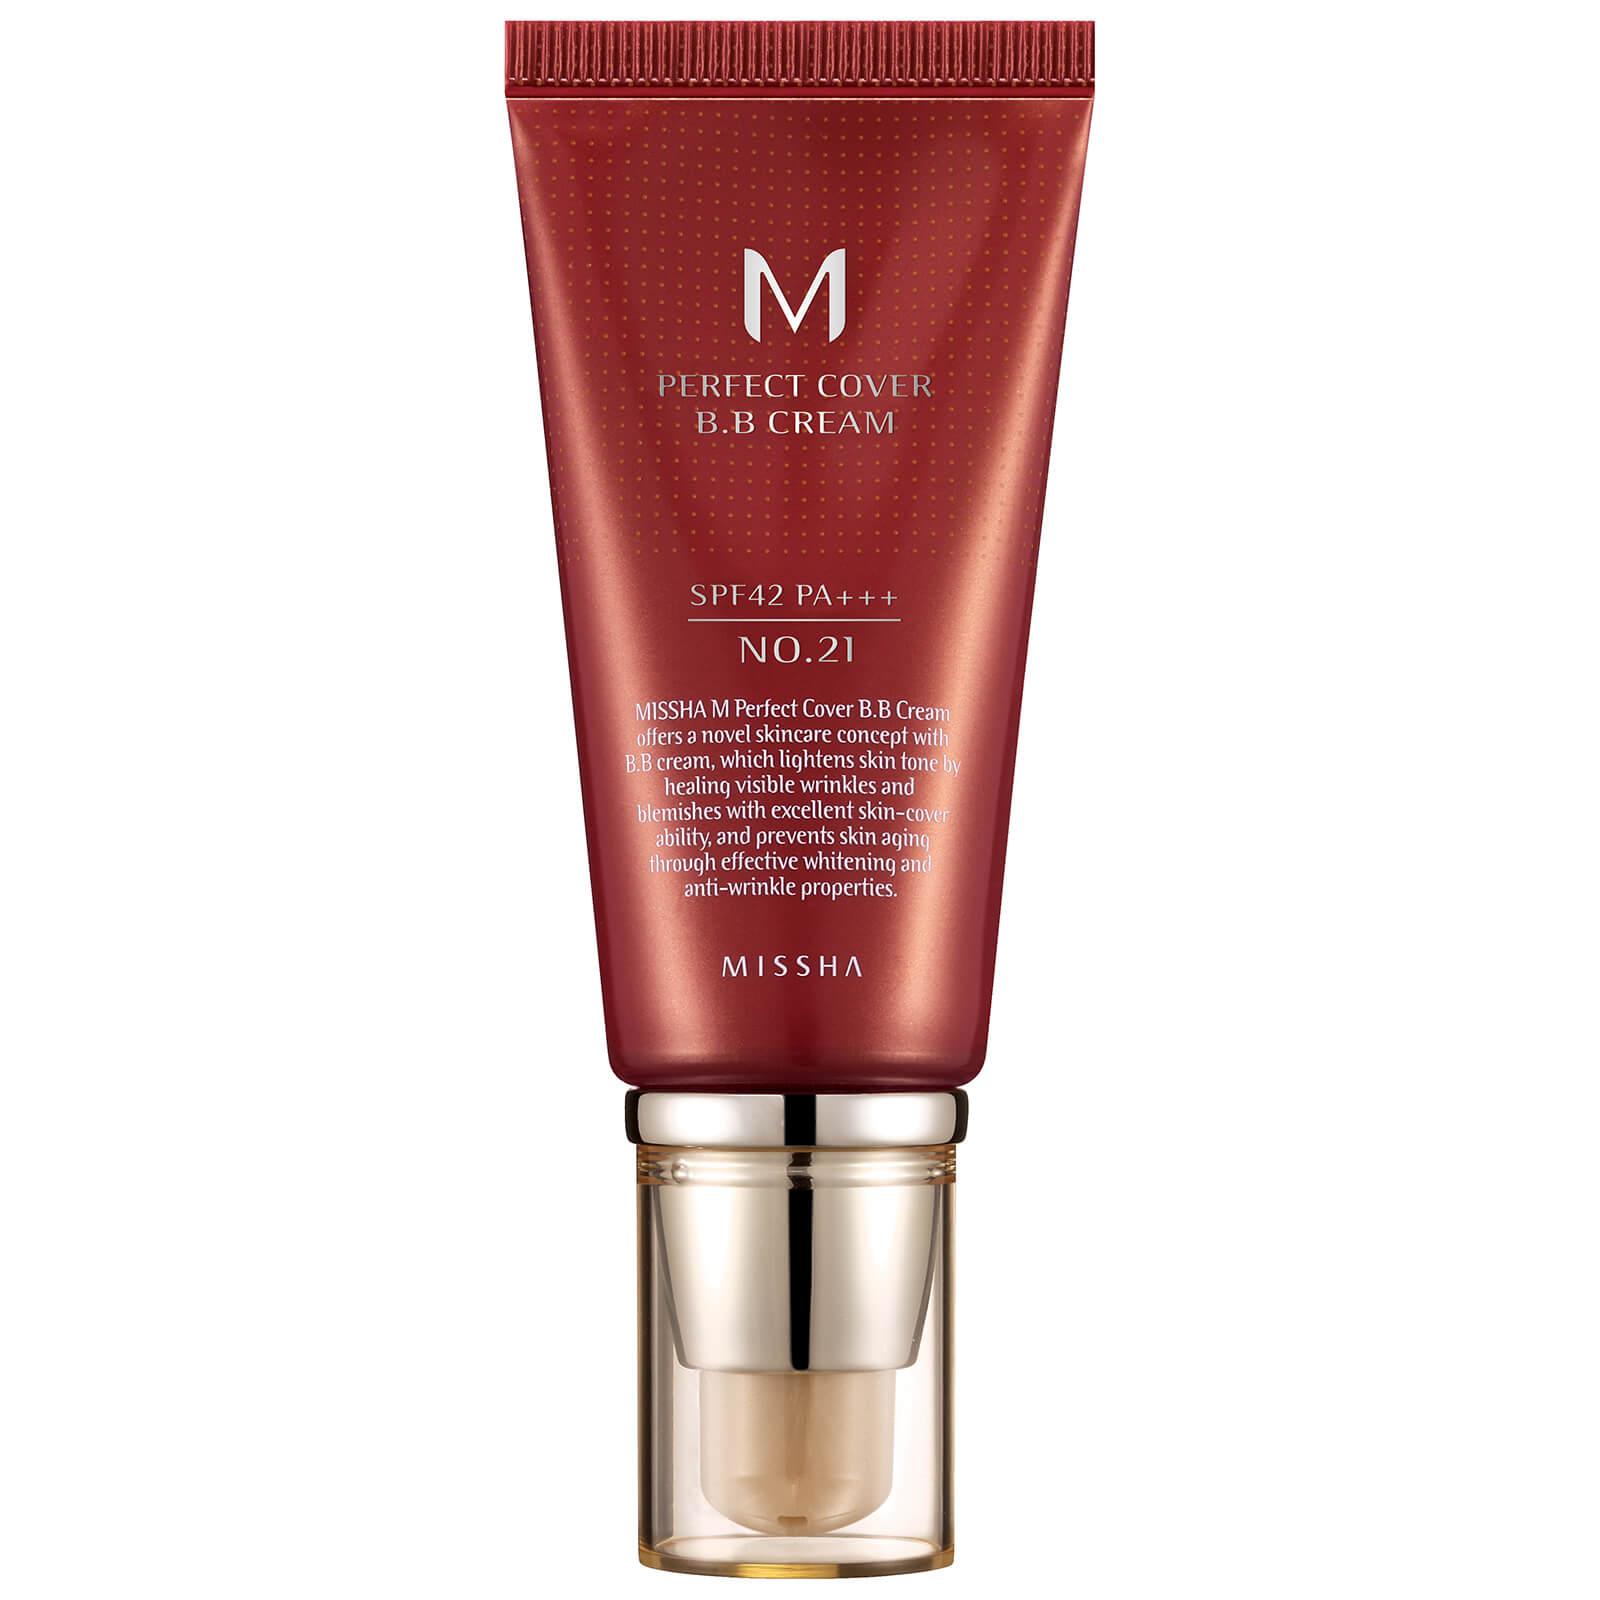 MISSHA M Perfect Cover BB Cream #21 Light Beige